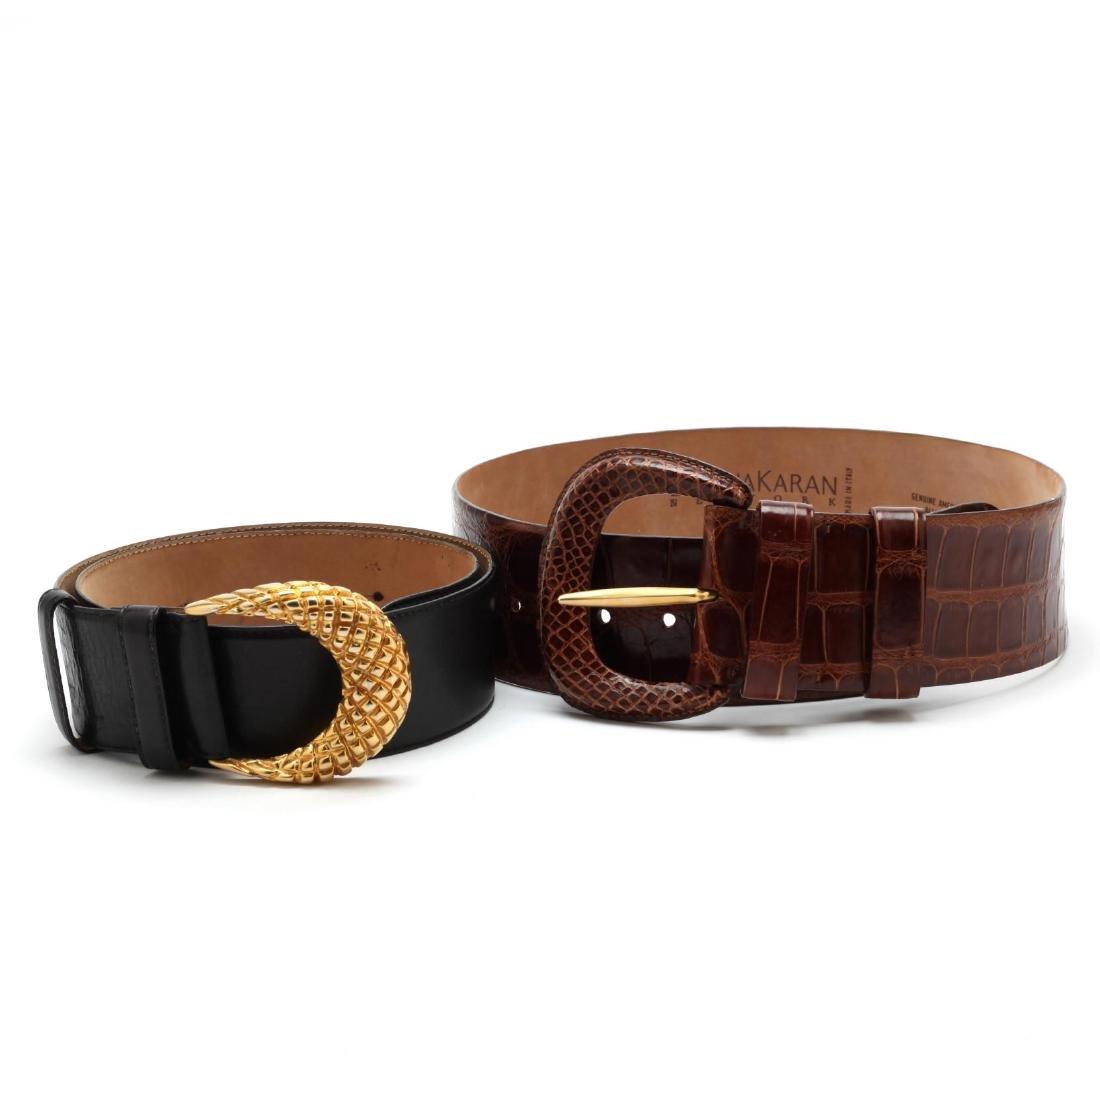 Two Donna Karan New York Leather Belts